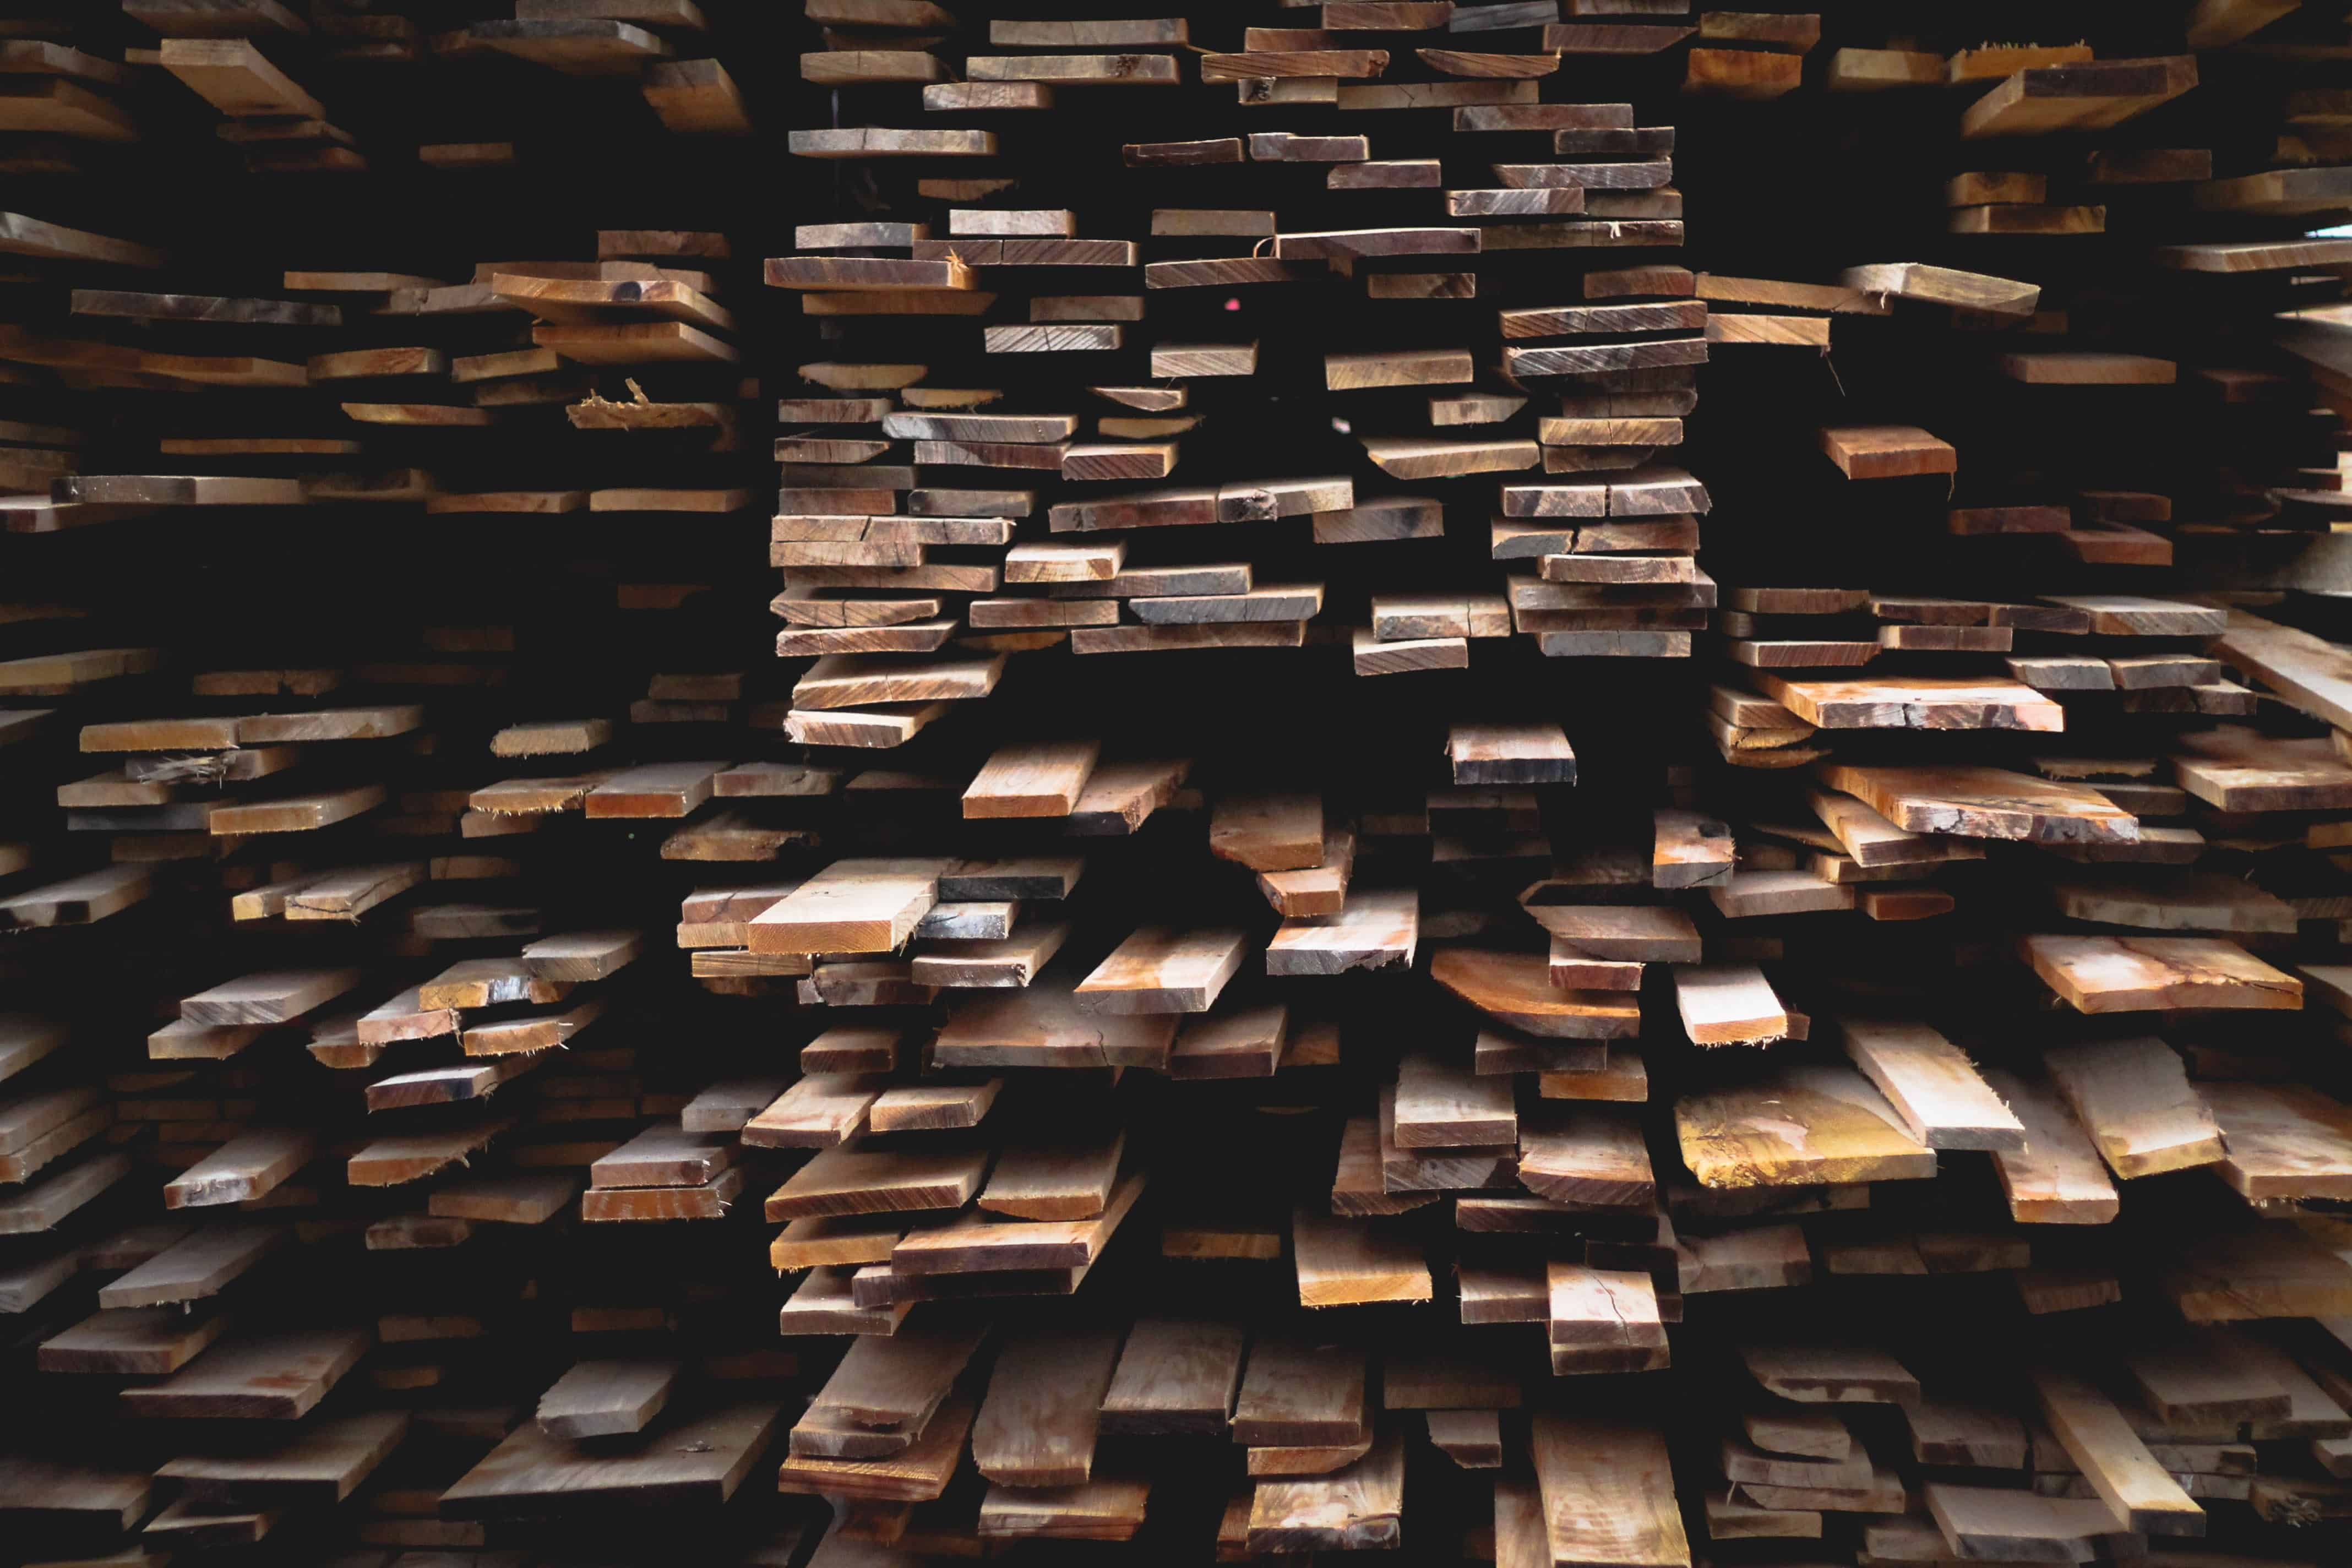 Altholzbretter kaufen auf restado